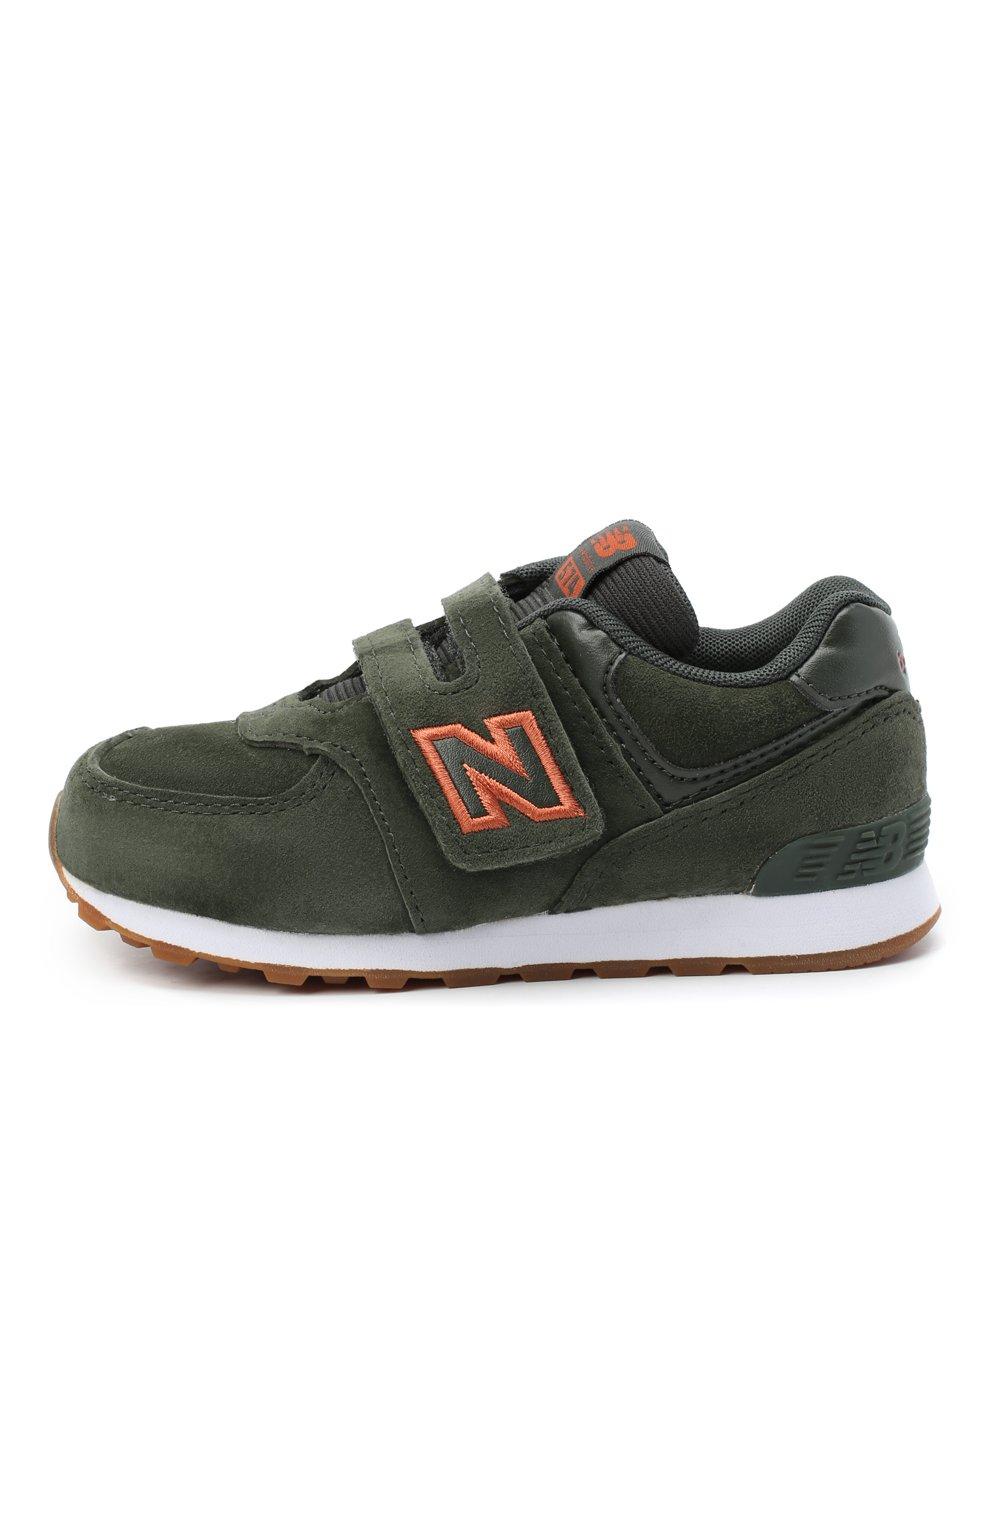 Детские кроссовки 574 NEW BALANCE темно-зеленого цвета, арт. IV574PGO/M | Фото 2 (Стили: Гранж)